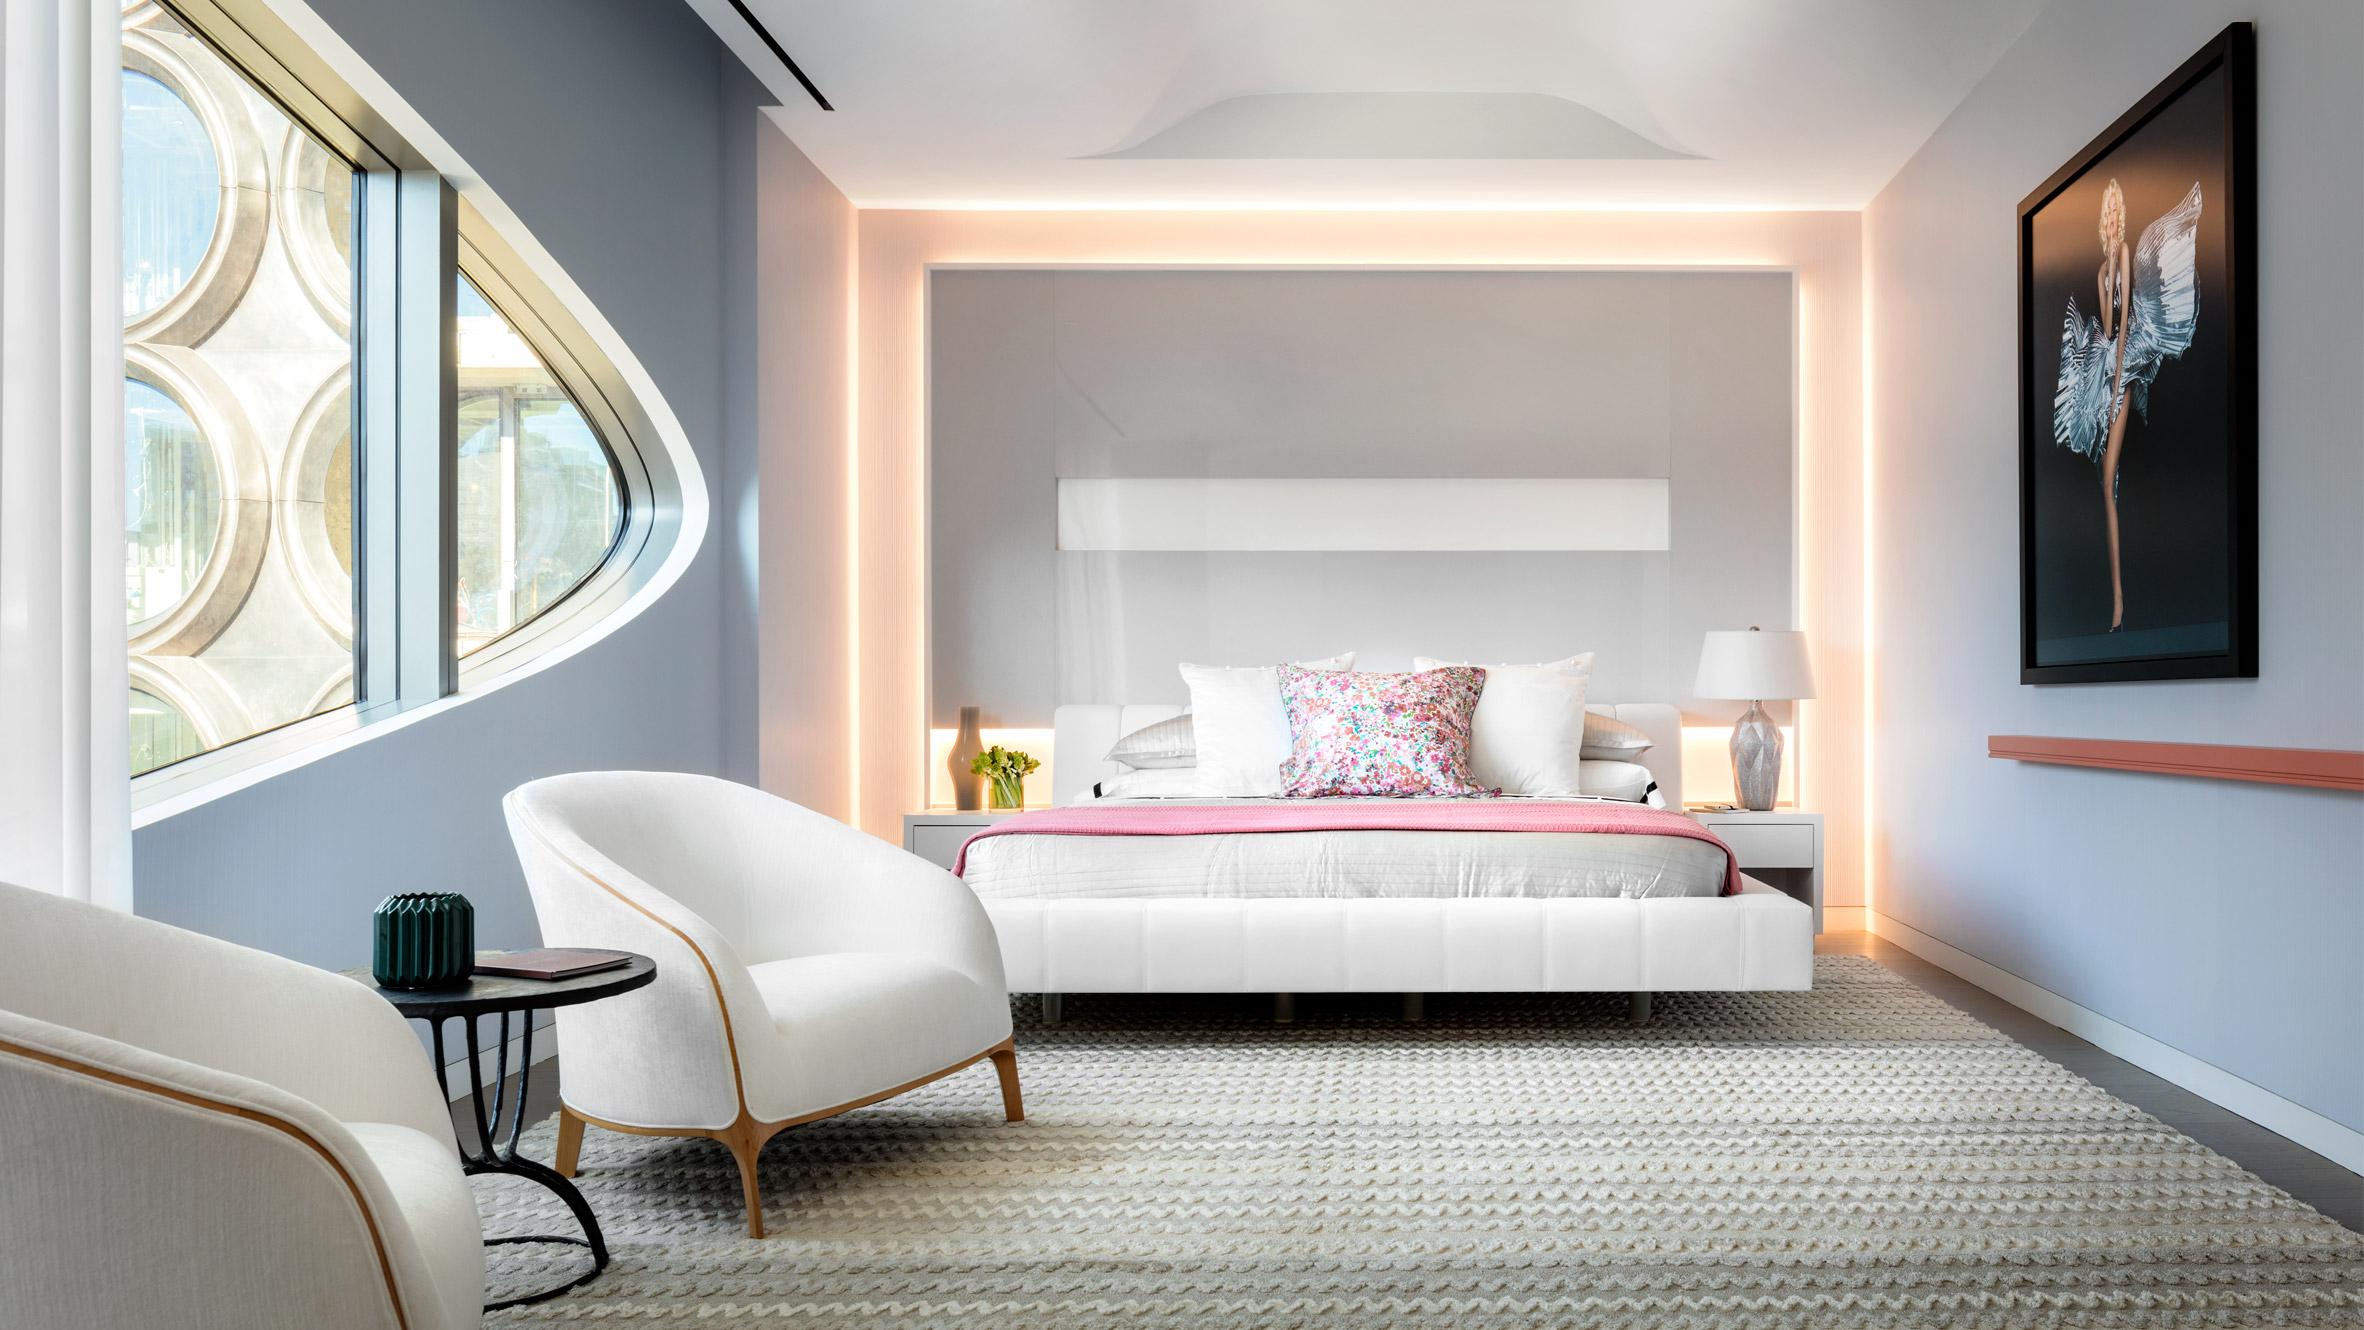 Interior of Zaha Hadid's 520 West 28th Street Apartments